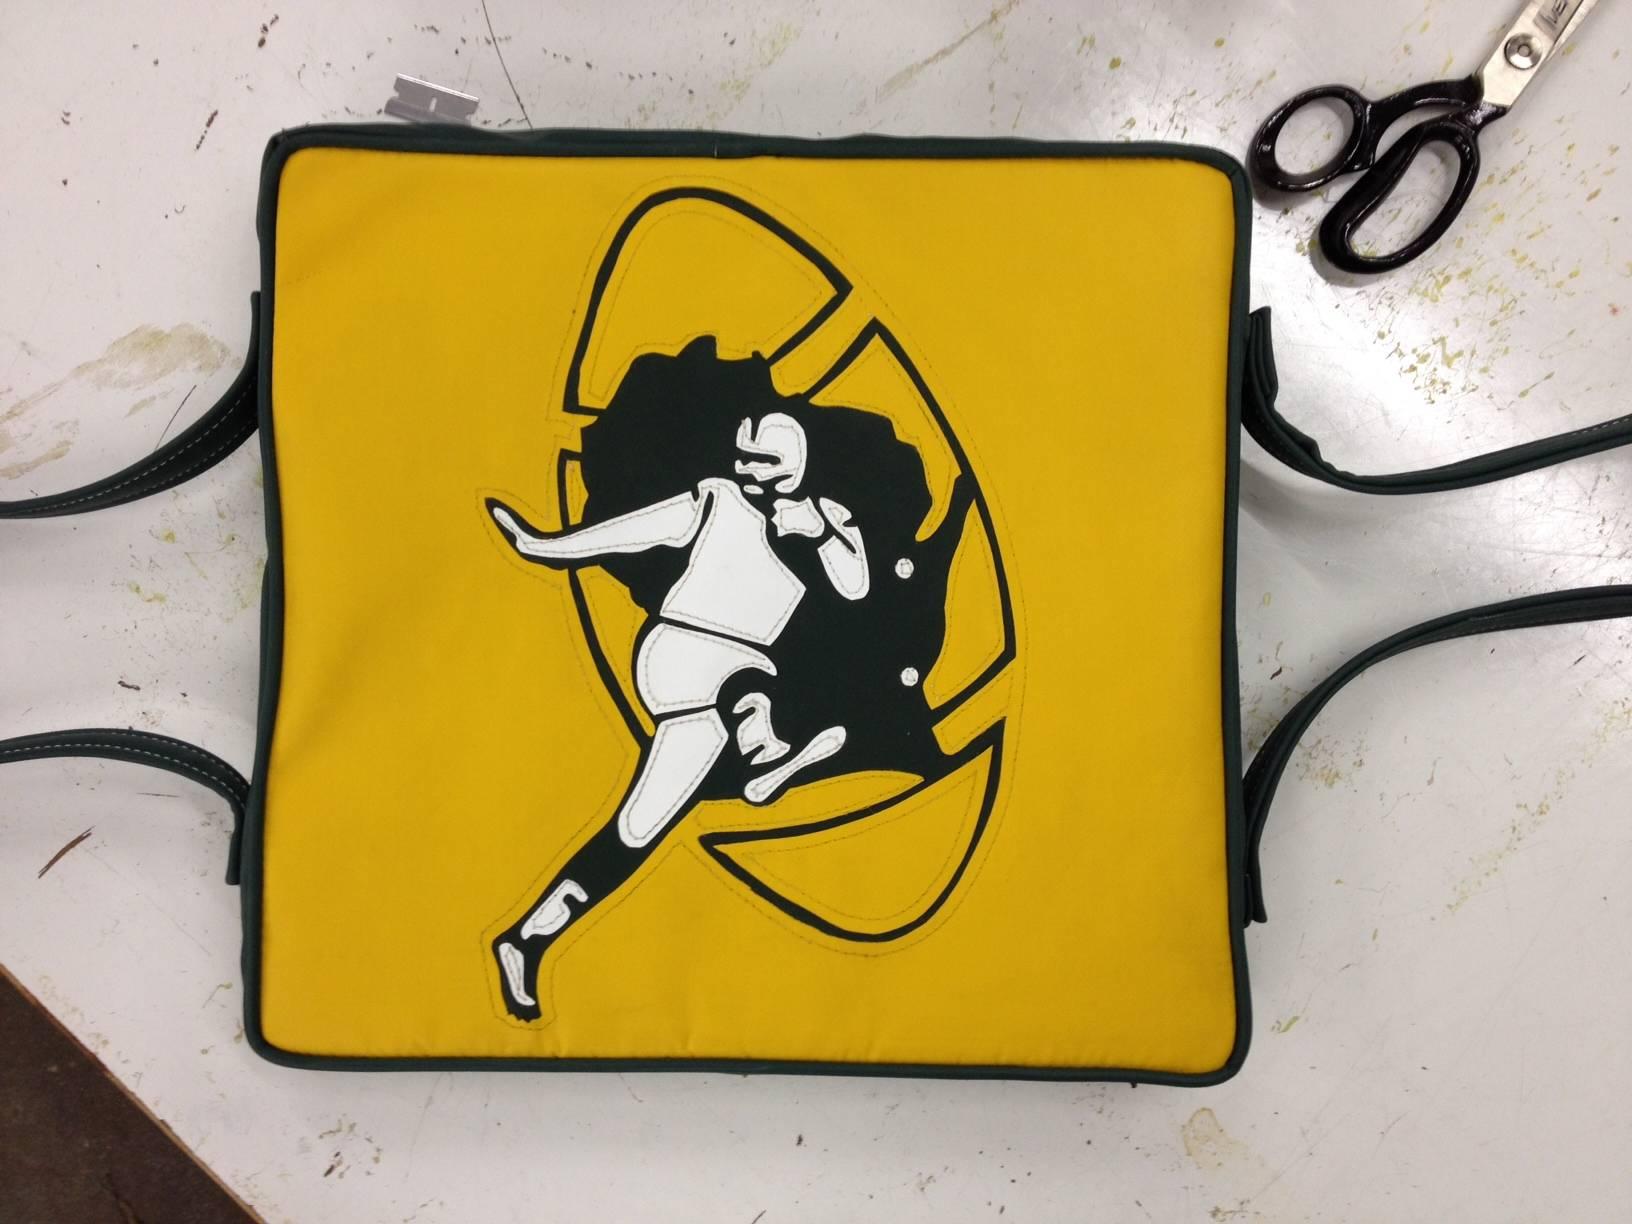 Vintage Packers logo life preserver